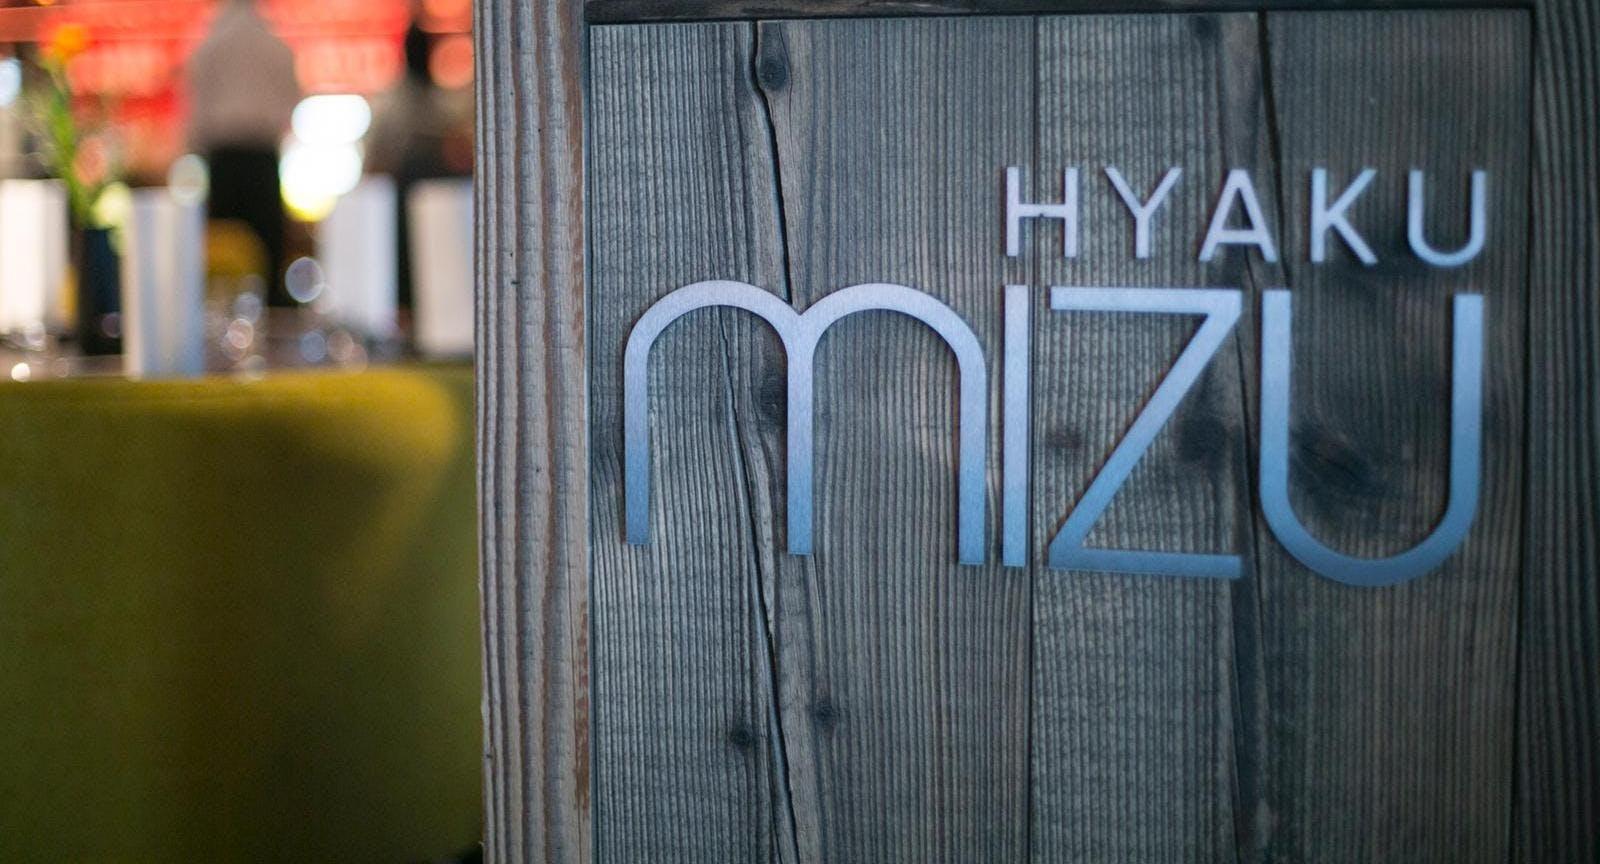 Hyaku Mizu - Asian Restaurant